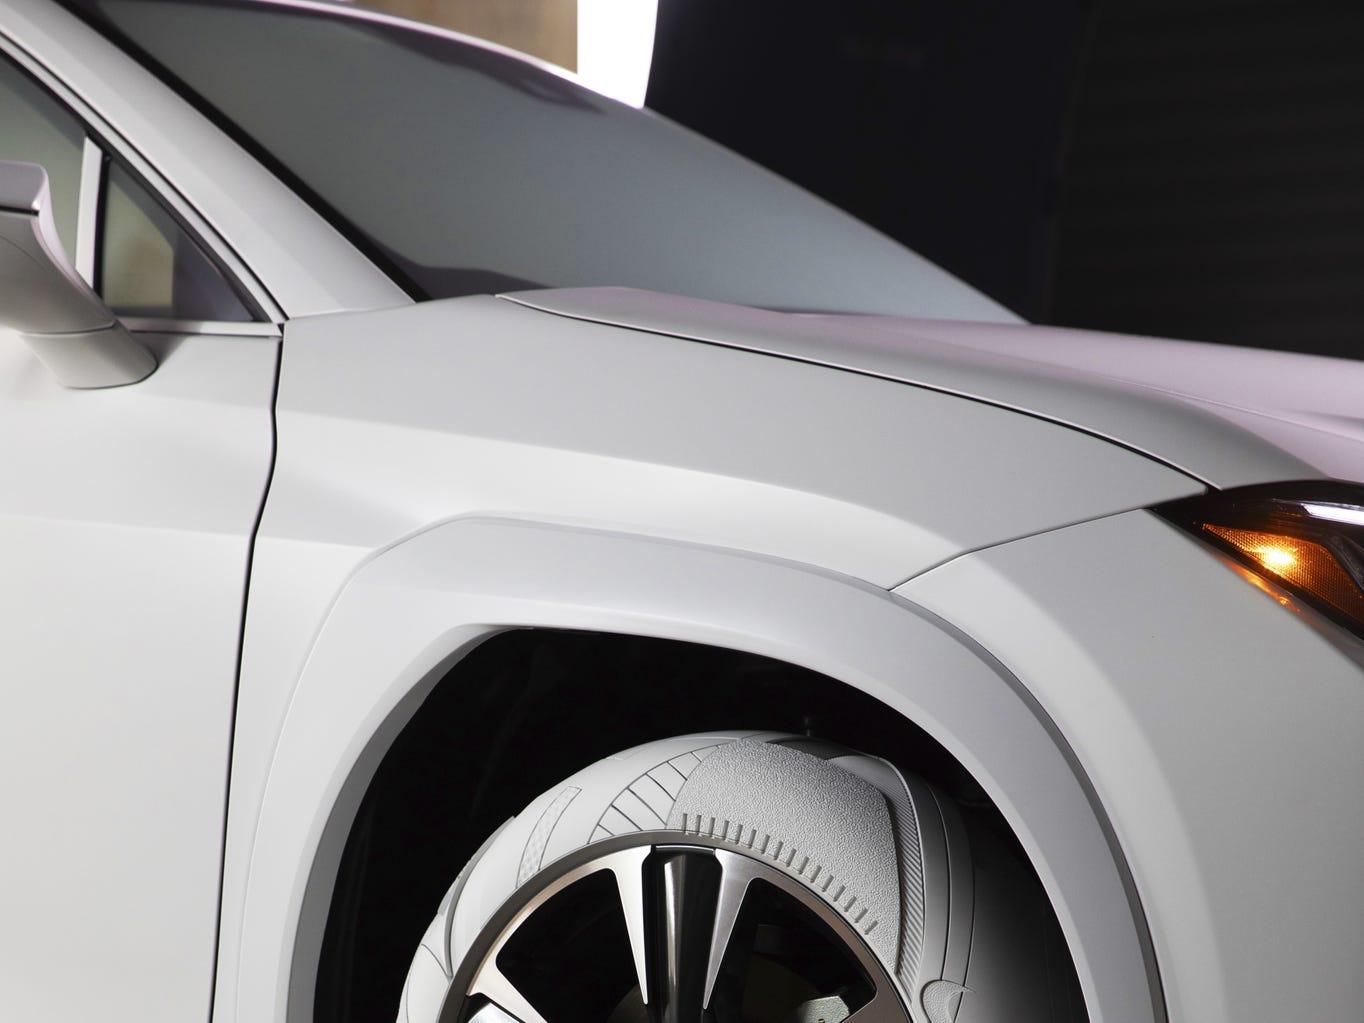 Custom tires inspired by John Elliott x Nike AF1 shoe.